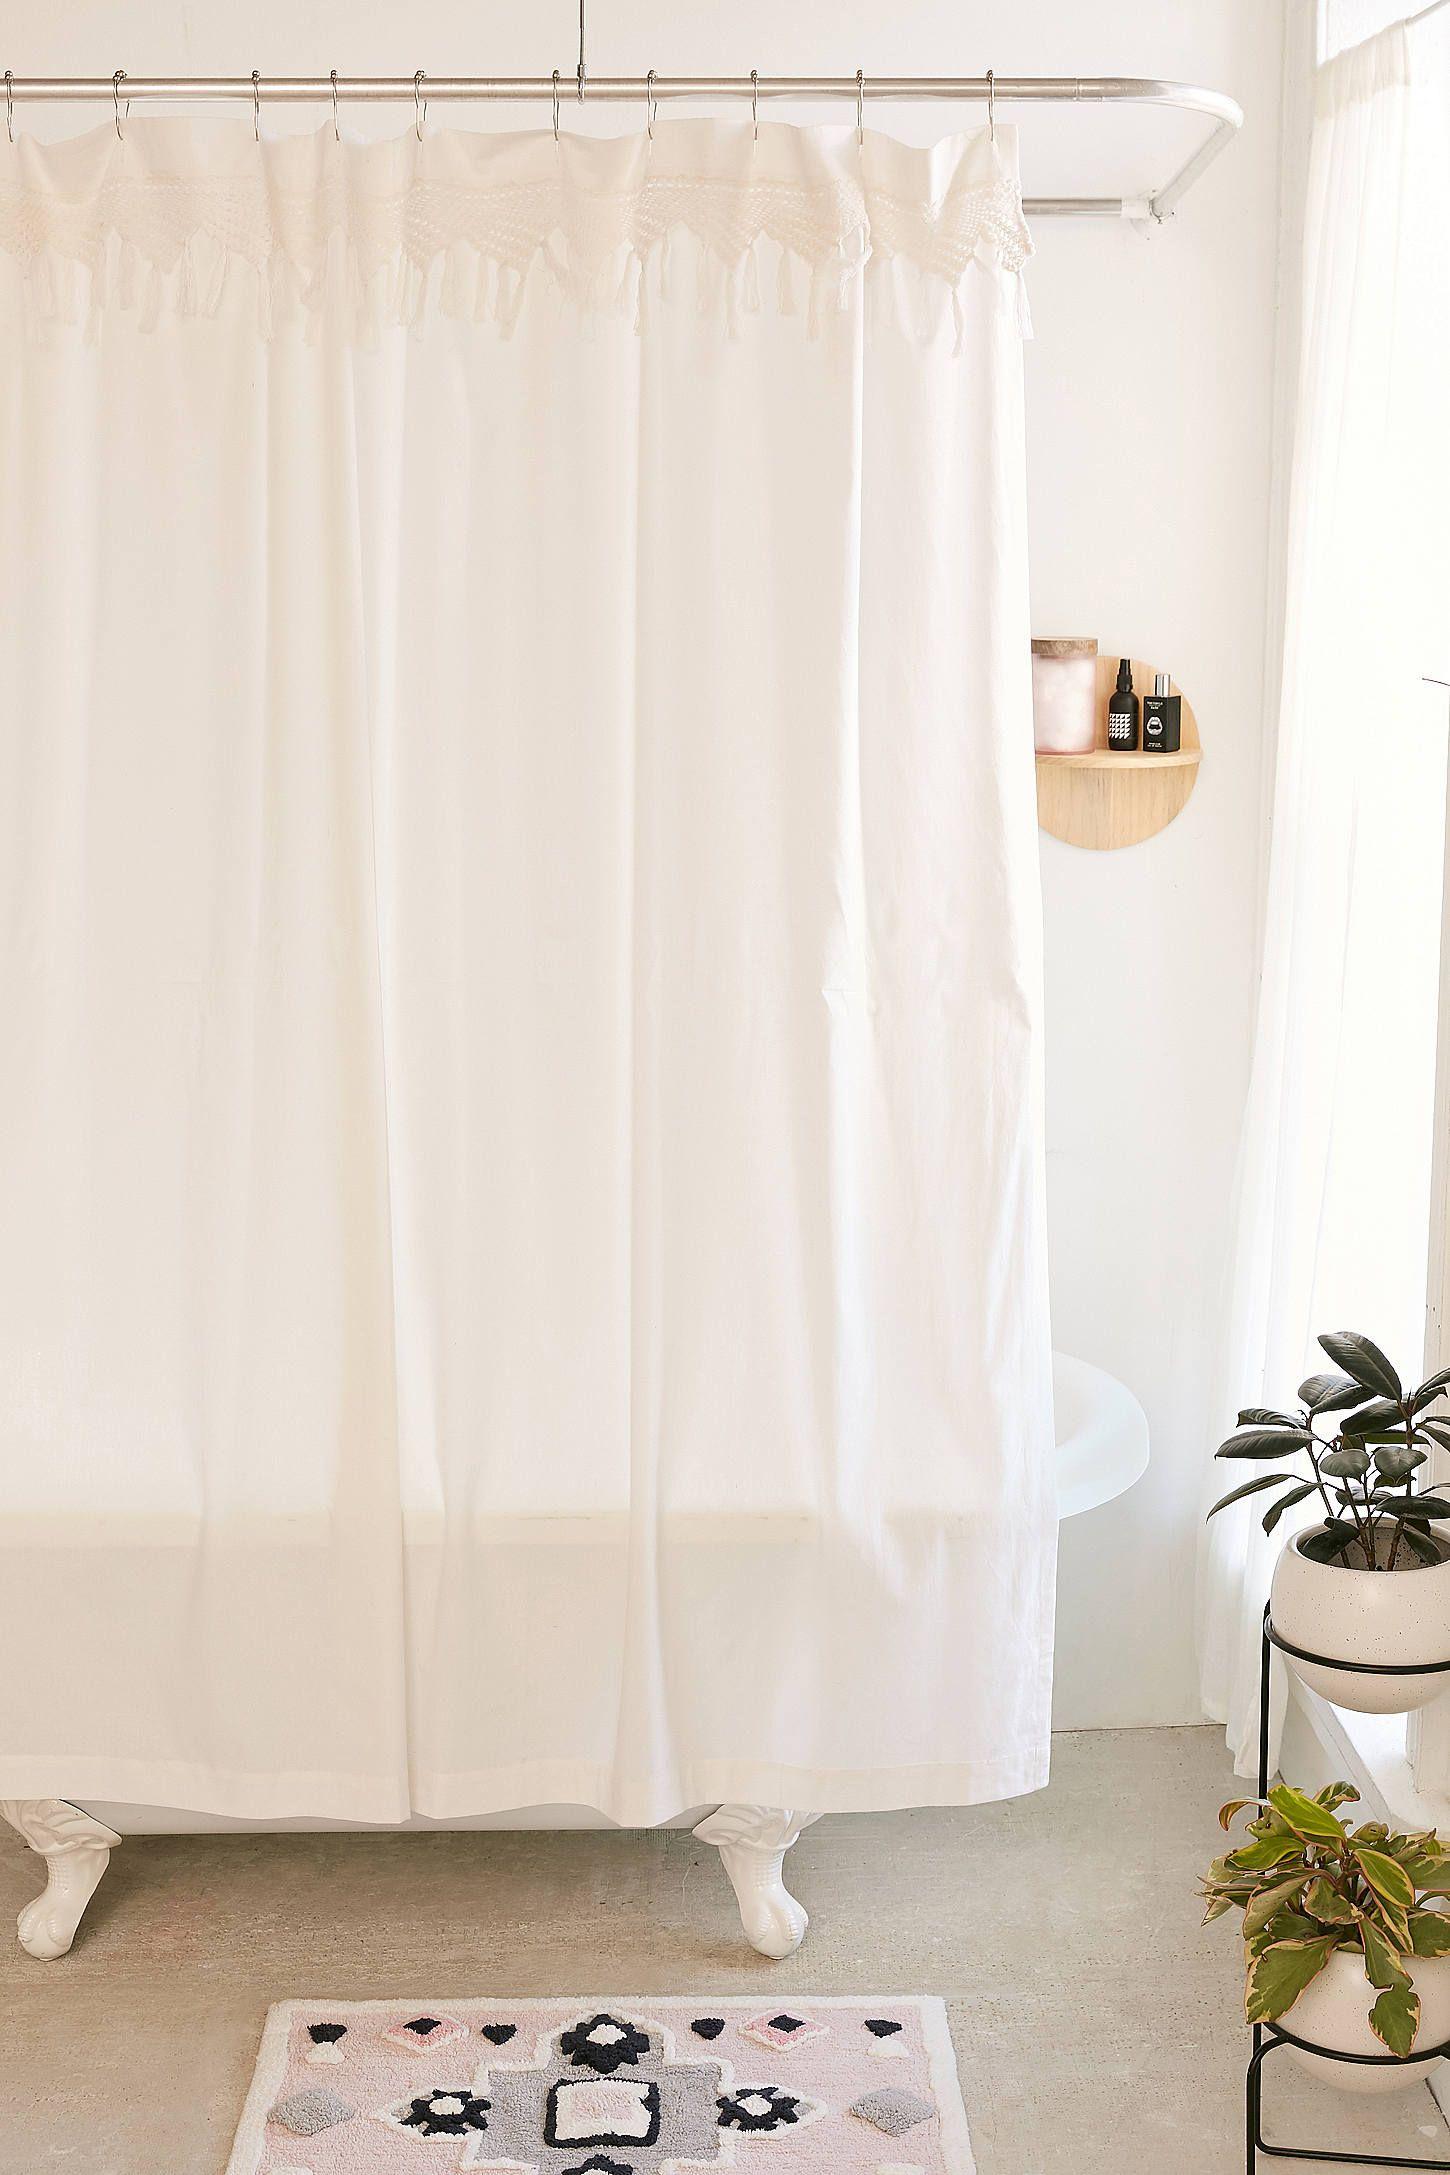 Shower Curtain Liner Curtains Bathroom Curtains Do It Yourself Bathrooms